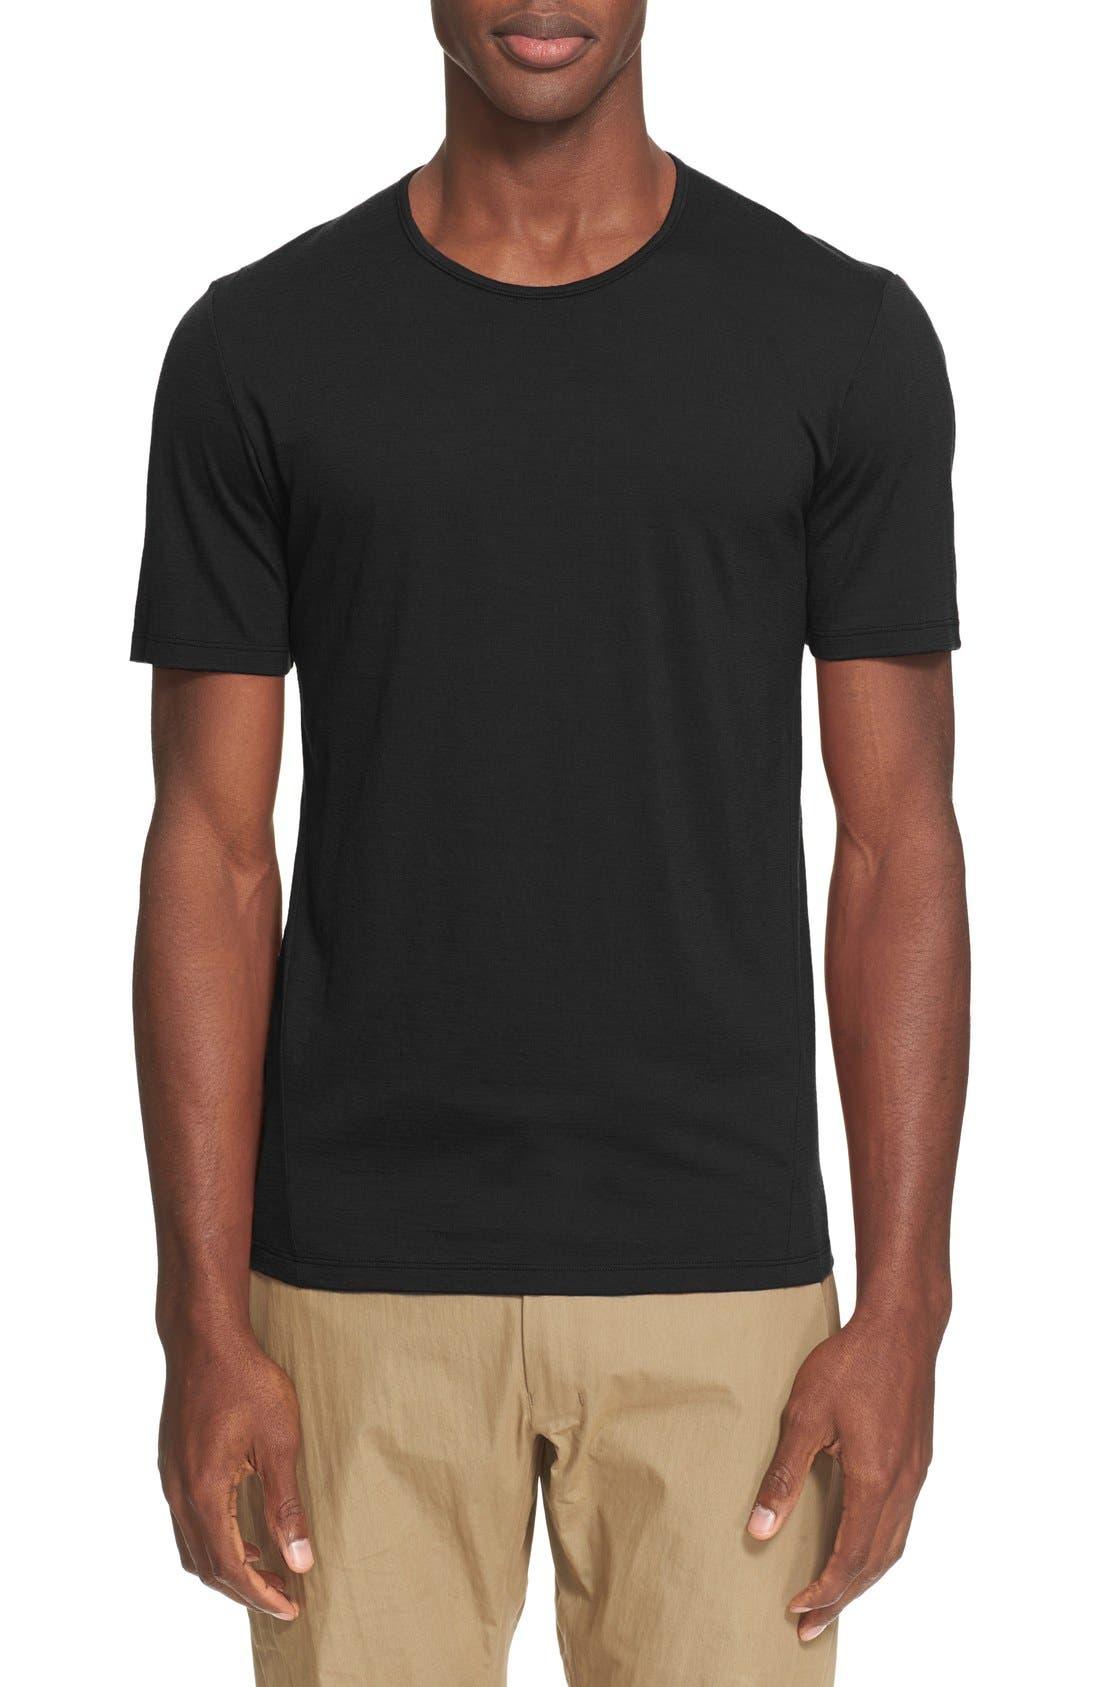 ARC'TERYX VEILANCE 'Frame' Merino Wool T-Shirt, Main, color, 001